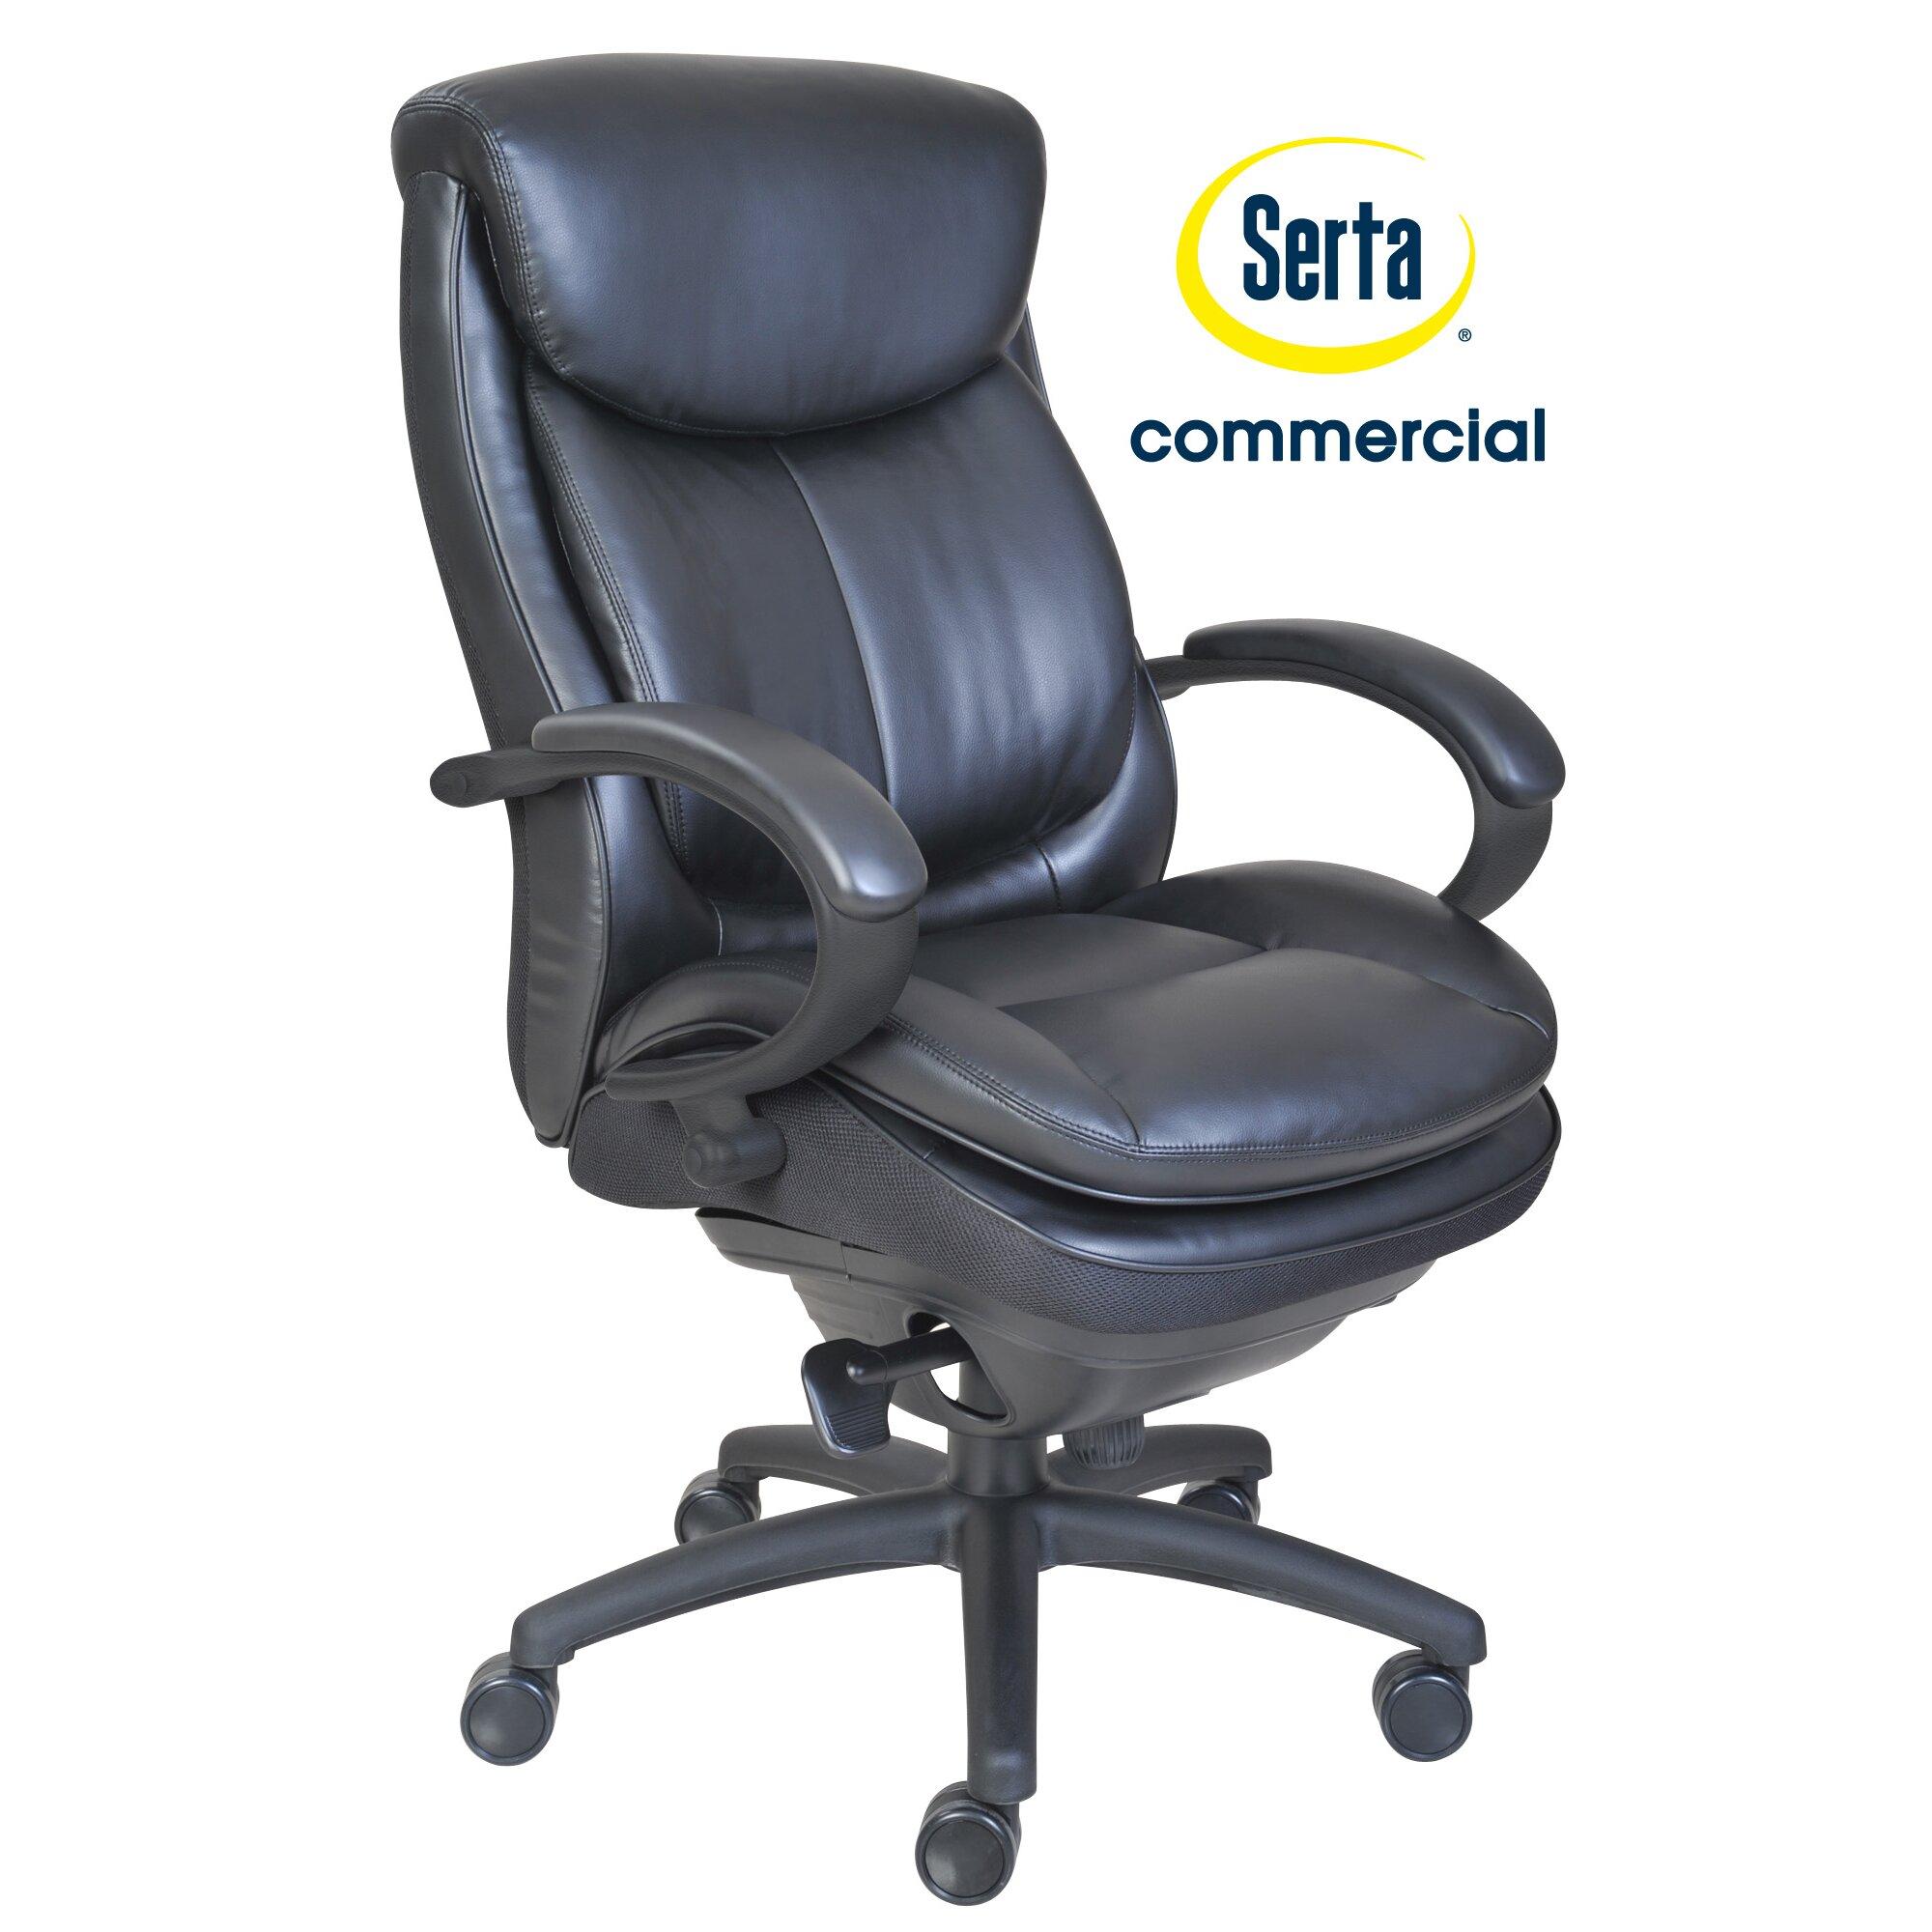 Series 300 Puresoft High Back Executive Chair